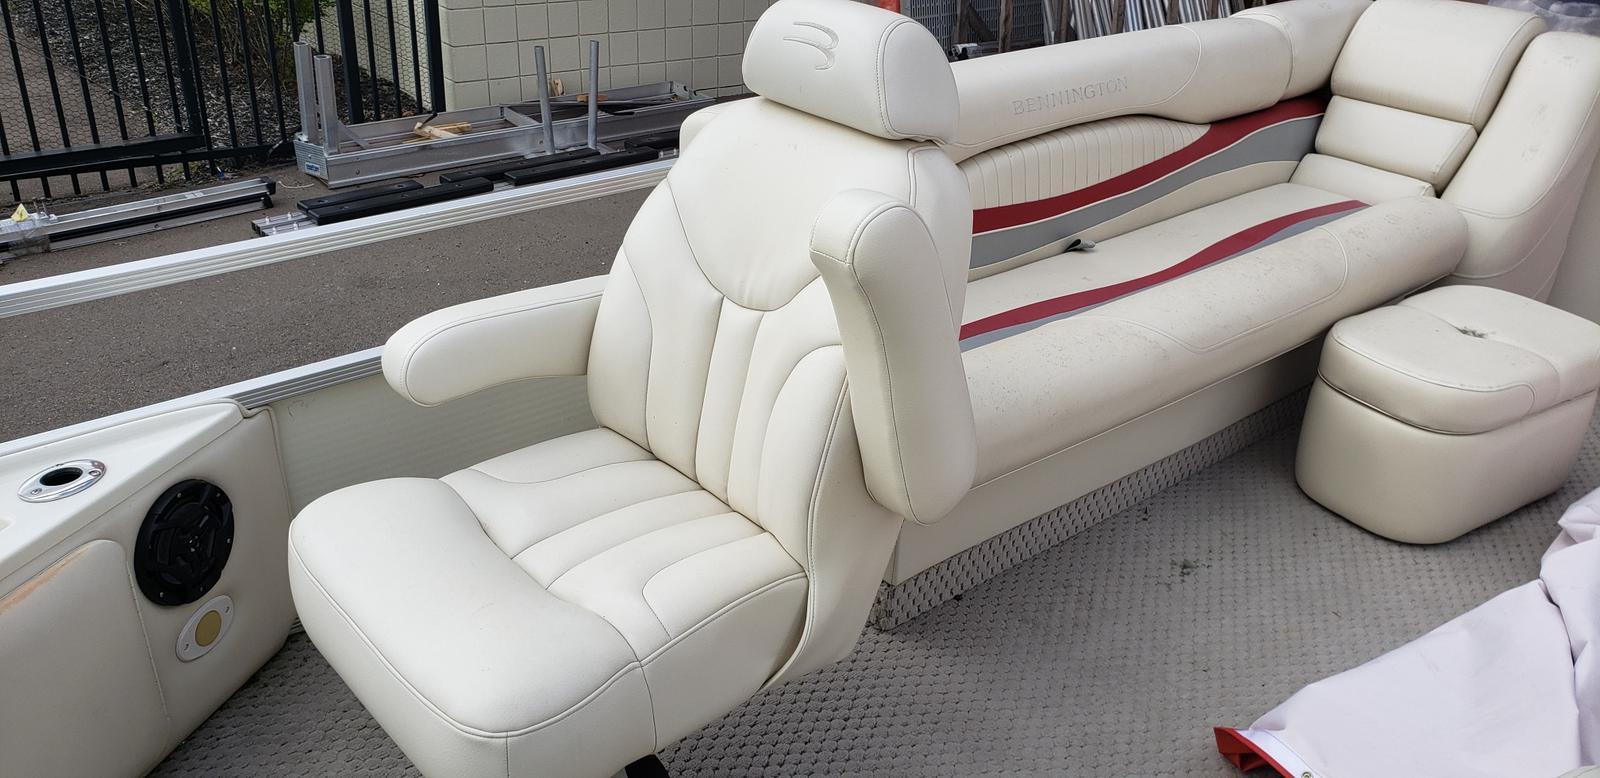 2007 Bennington boat for sale, model of the boat is 2577RFS & Image # 11 of 12